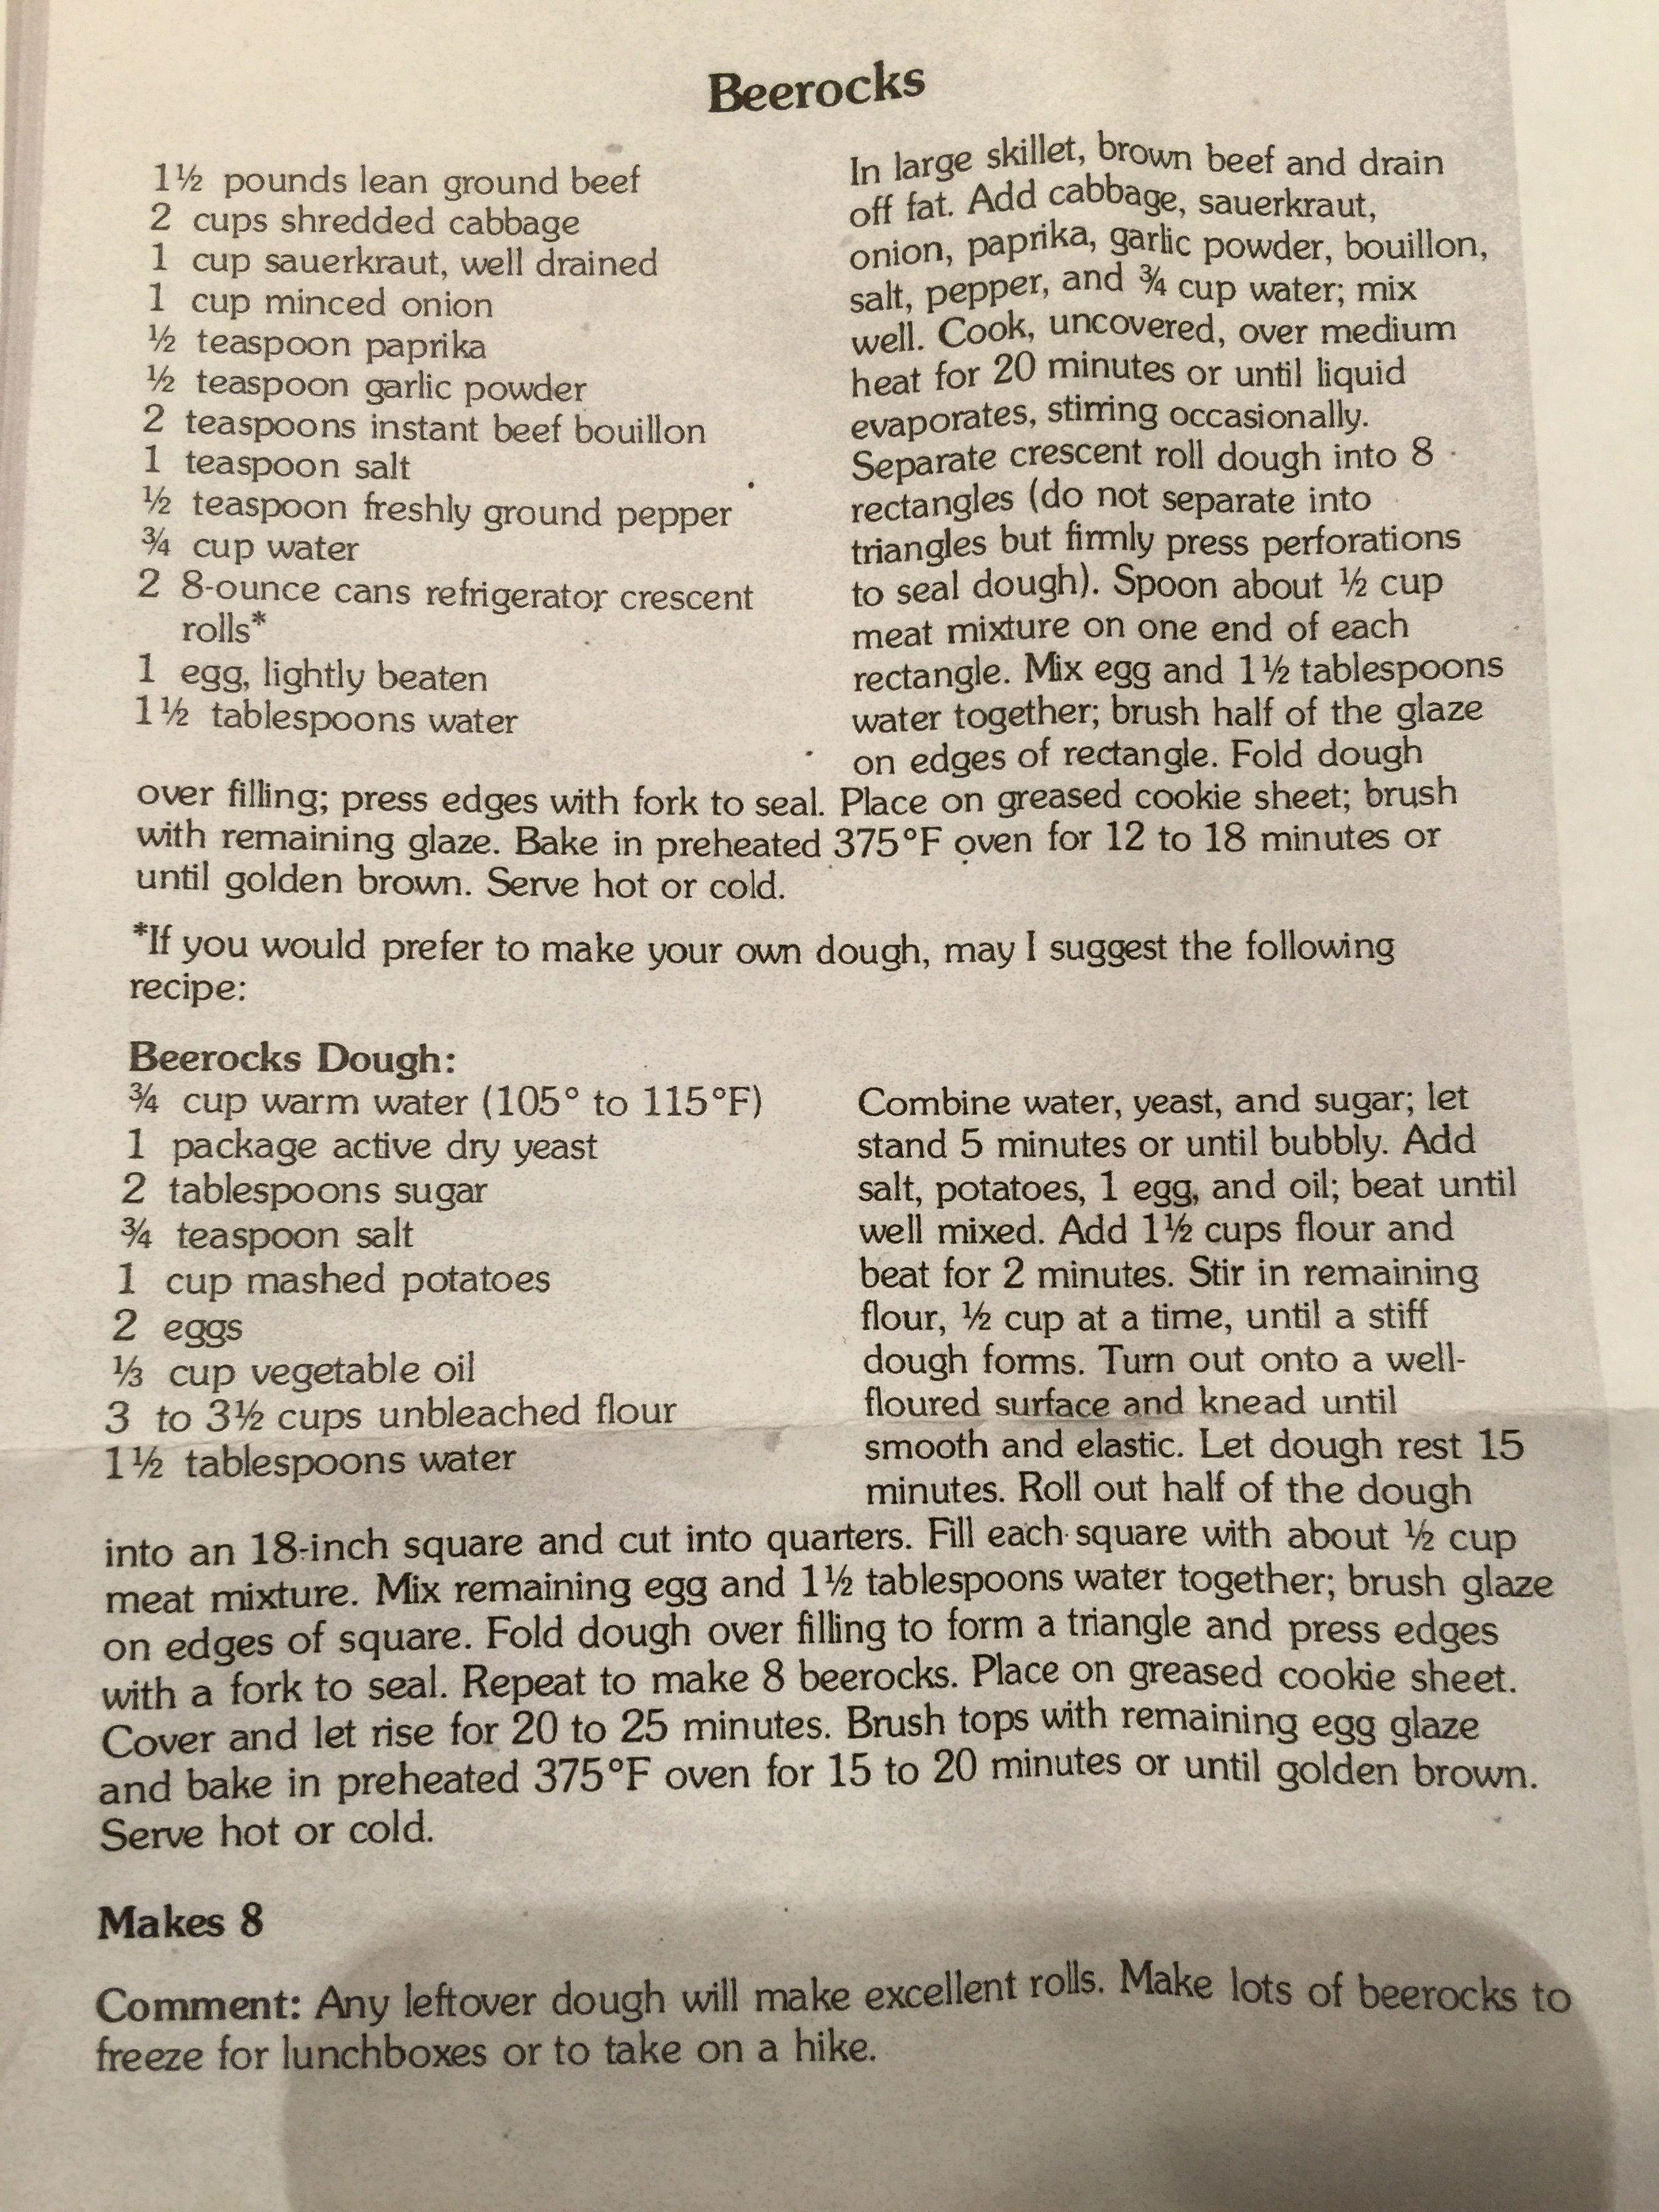 Bierocks (With images) Bierocks recipe, Beirocks recipe